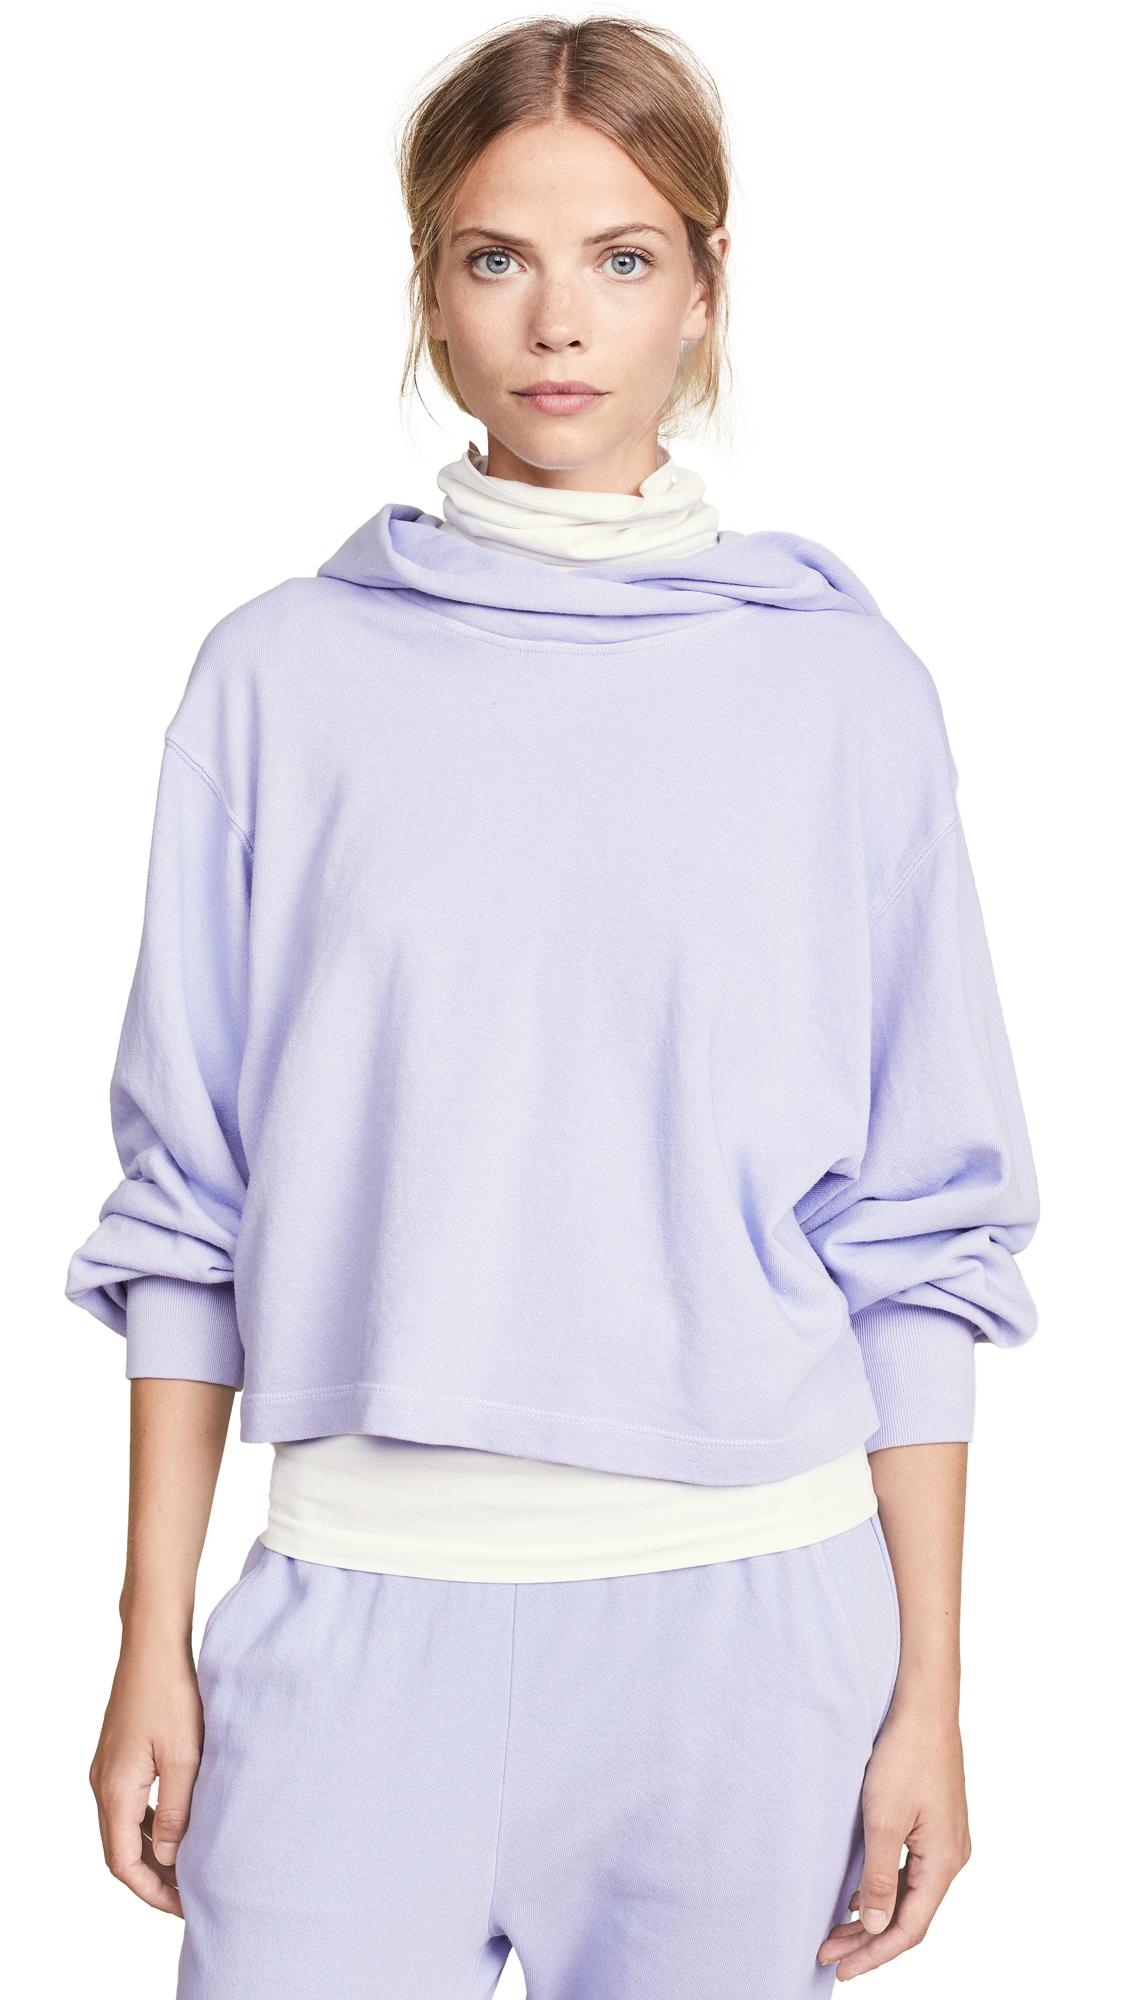 A.L.C. Ash Sweatshirt In Lavender